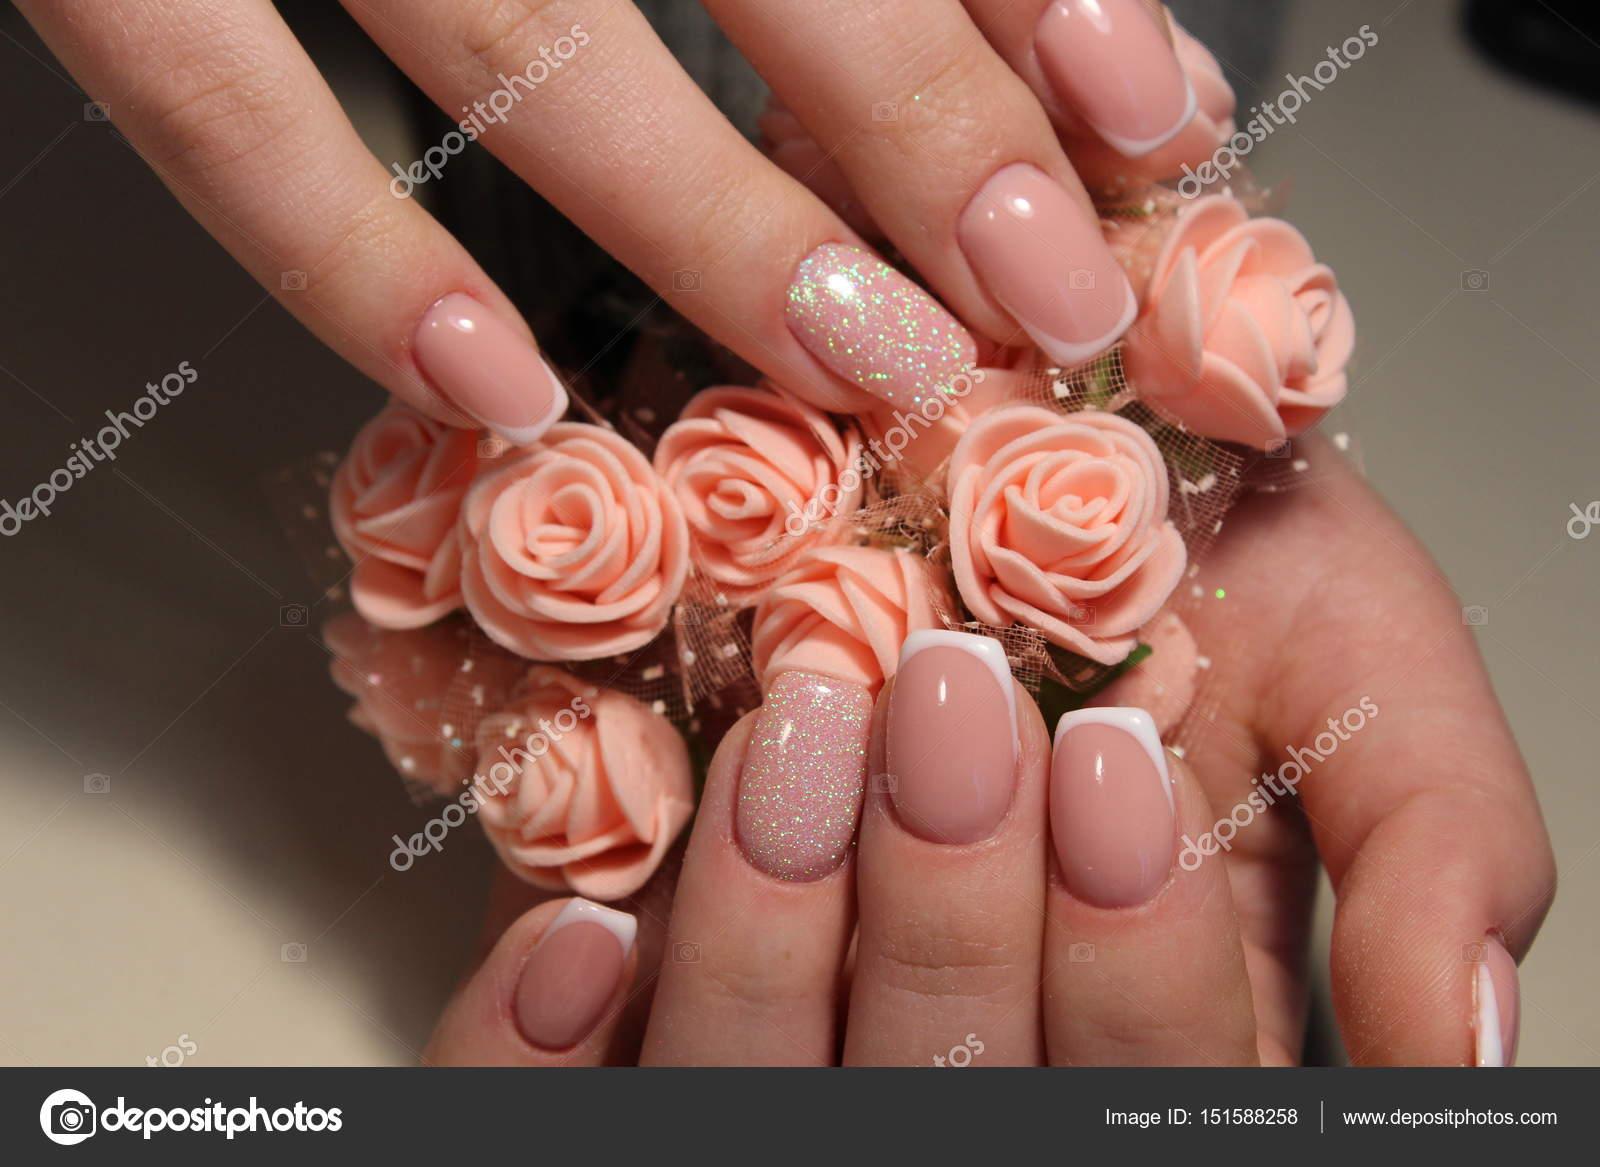 French manicure nail design — Stock Photo © SmirMaxStock #151588258